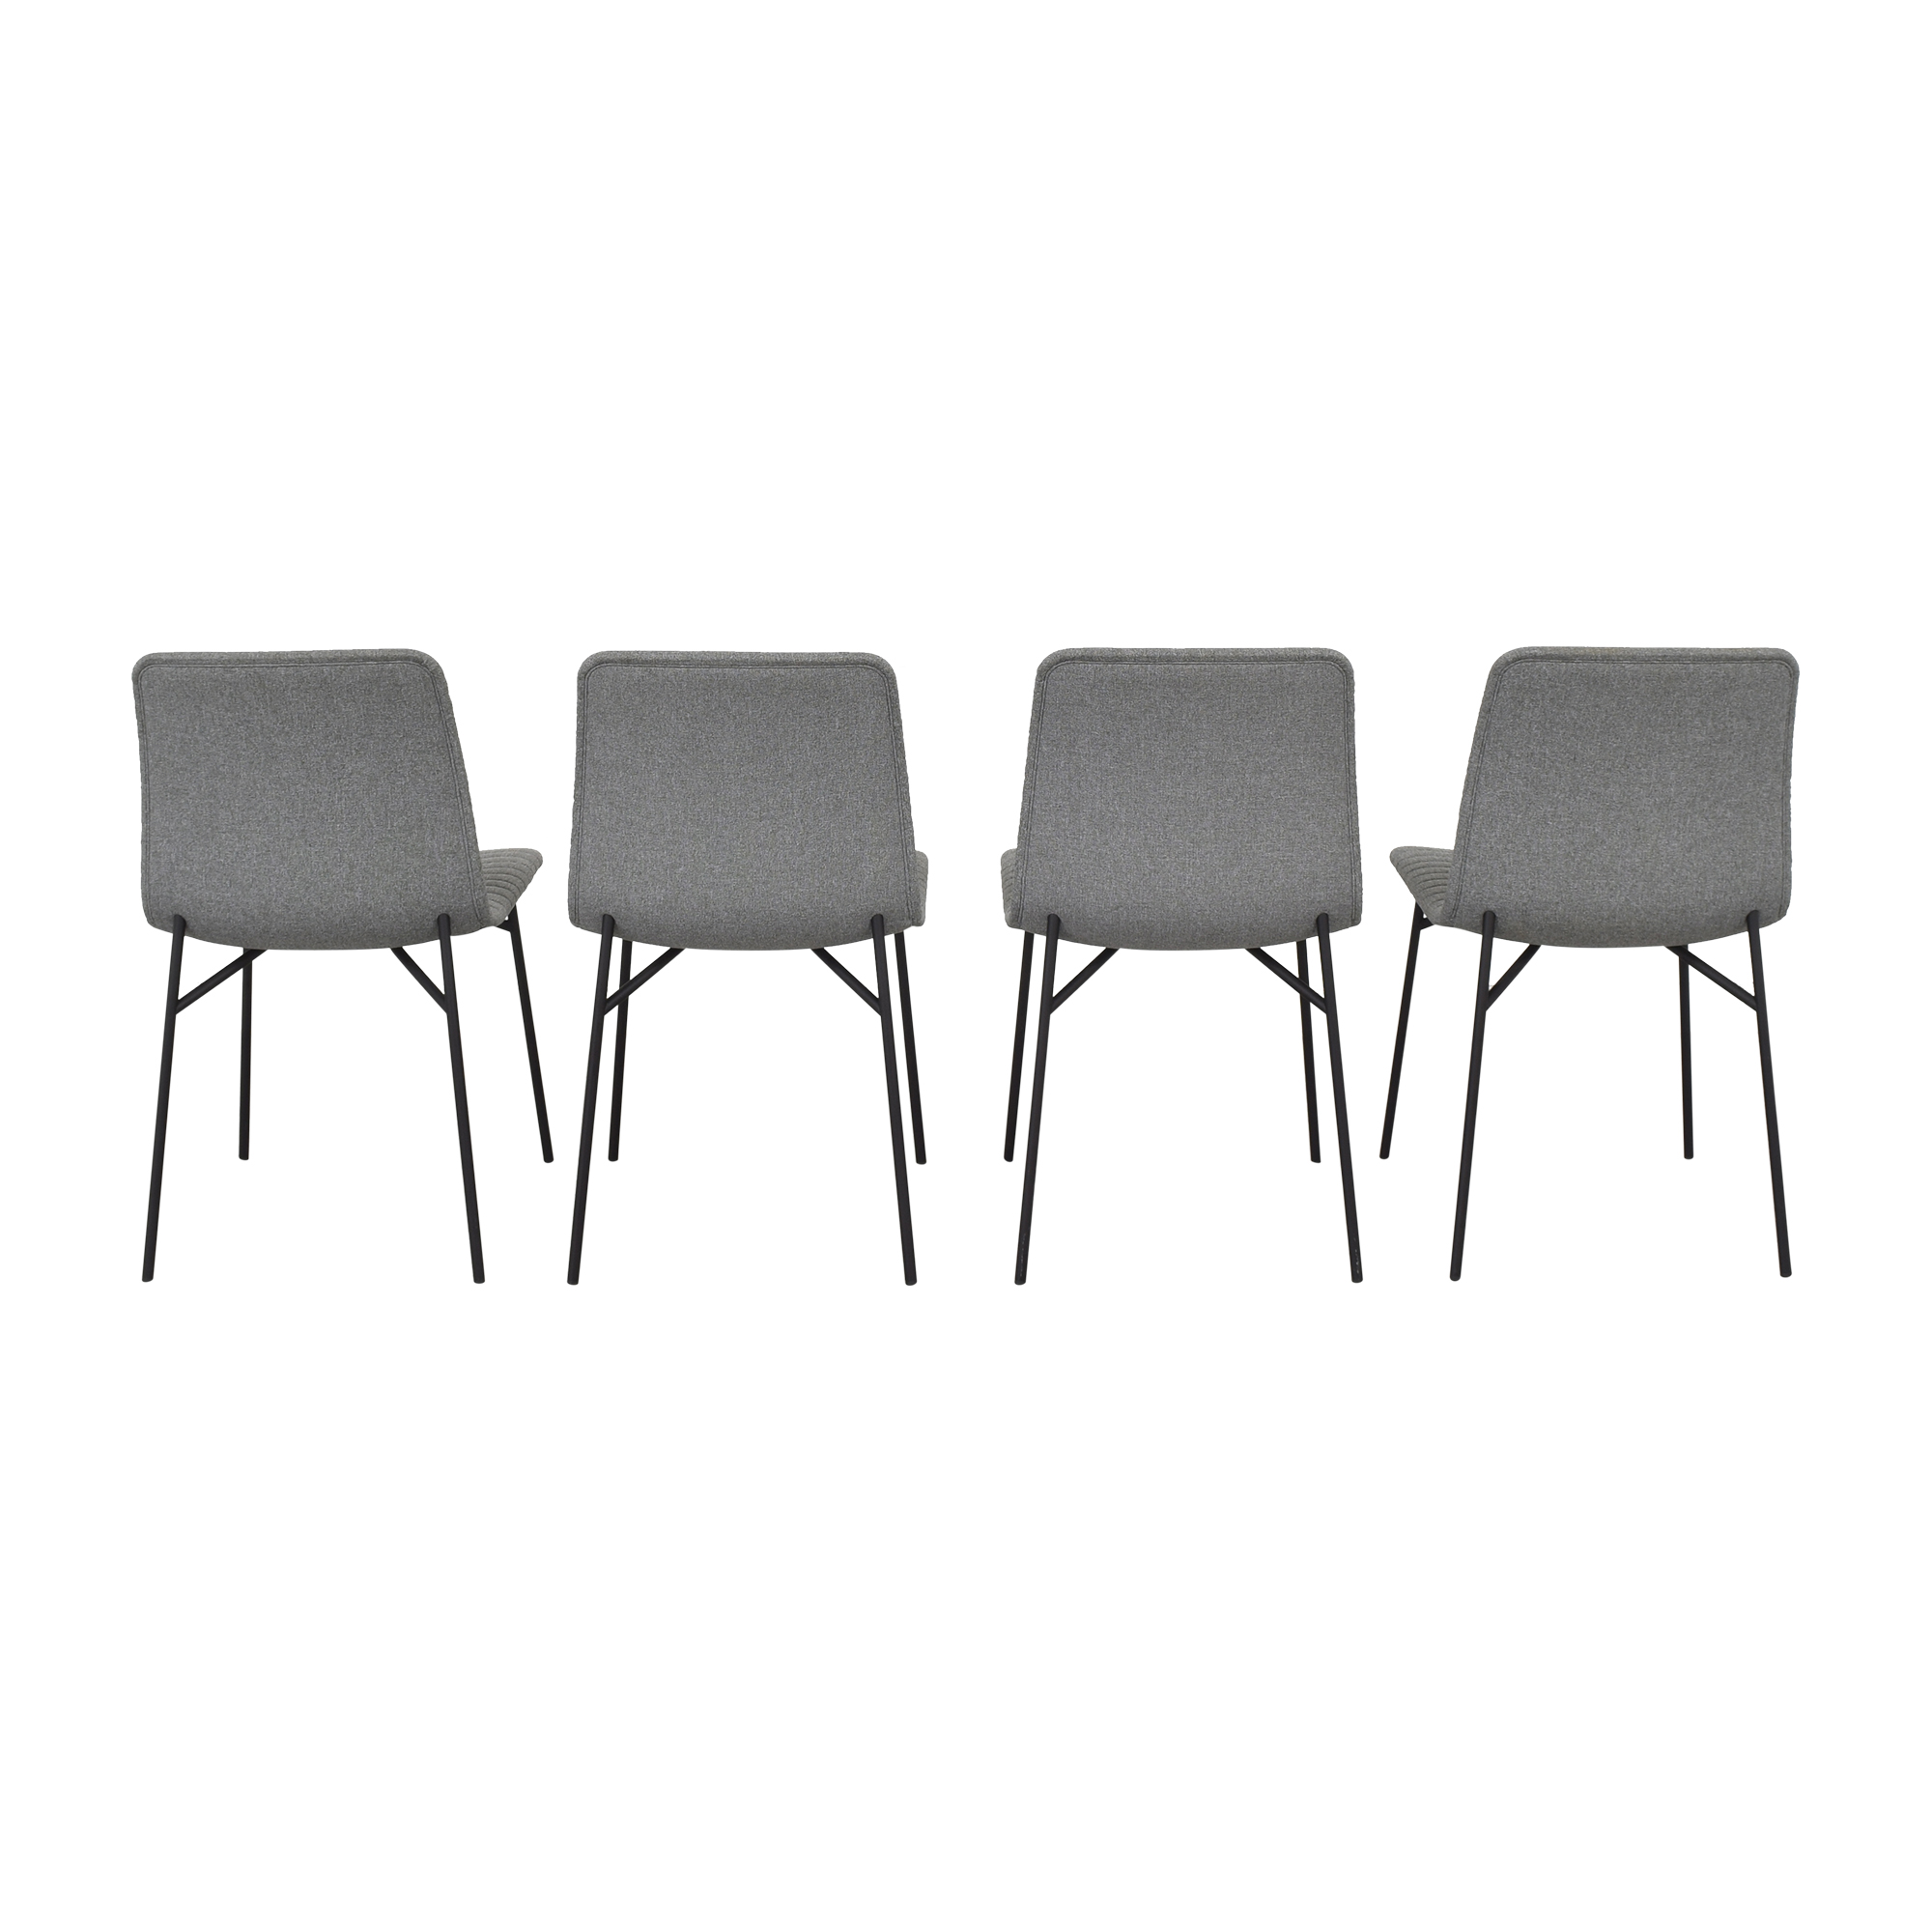 Fornasarig Fornasarig Data Chairs second hand